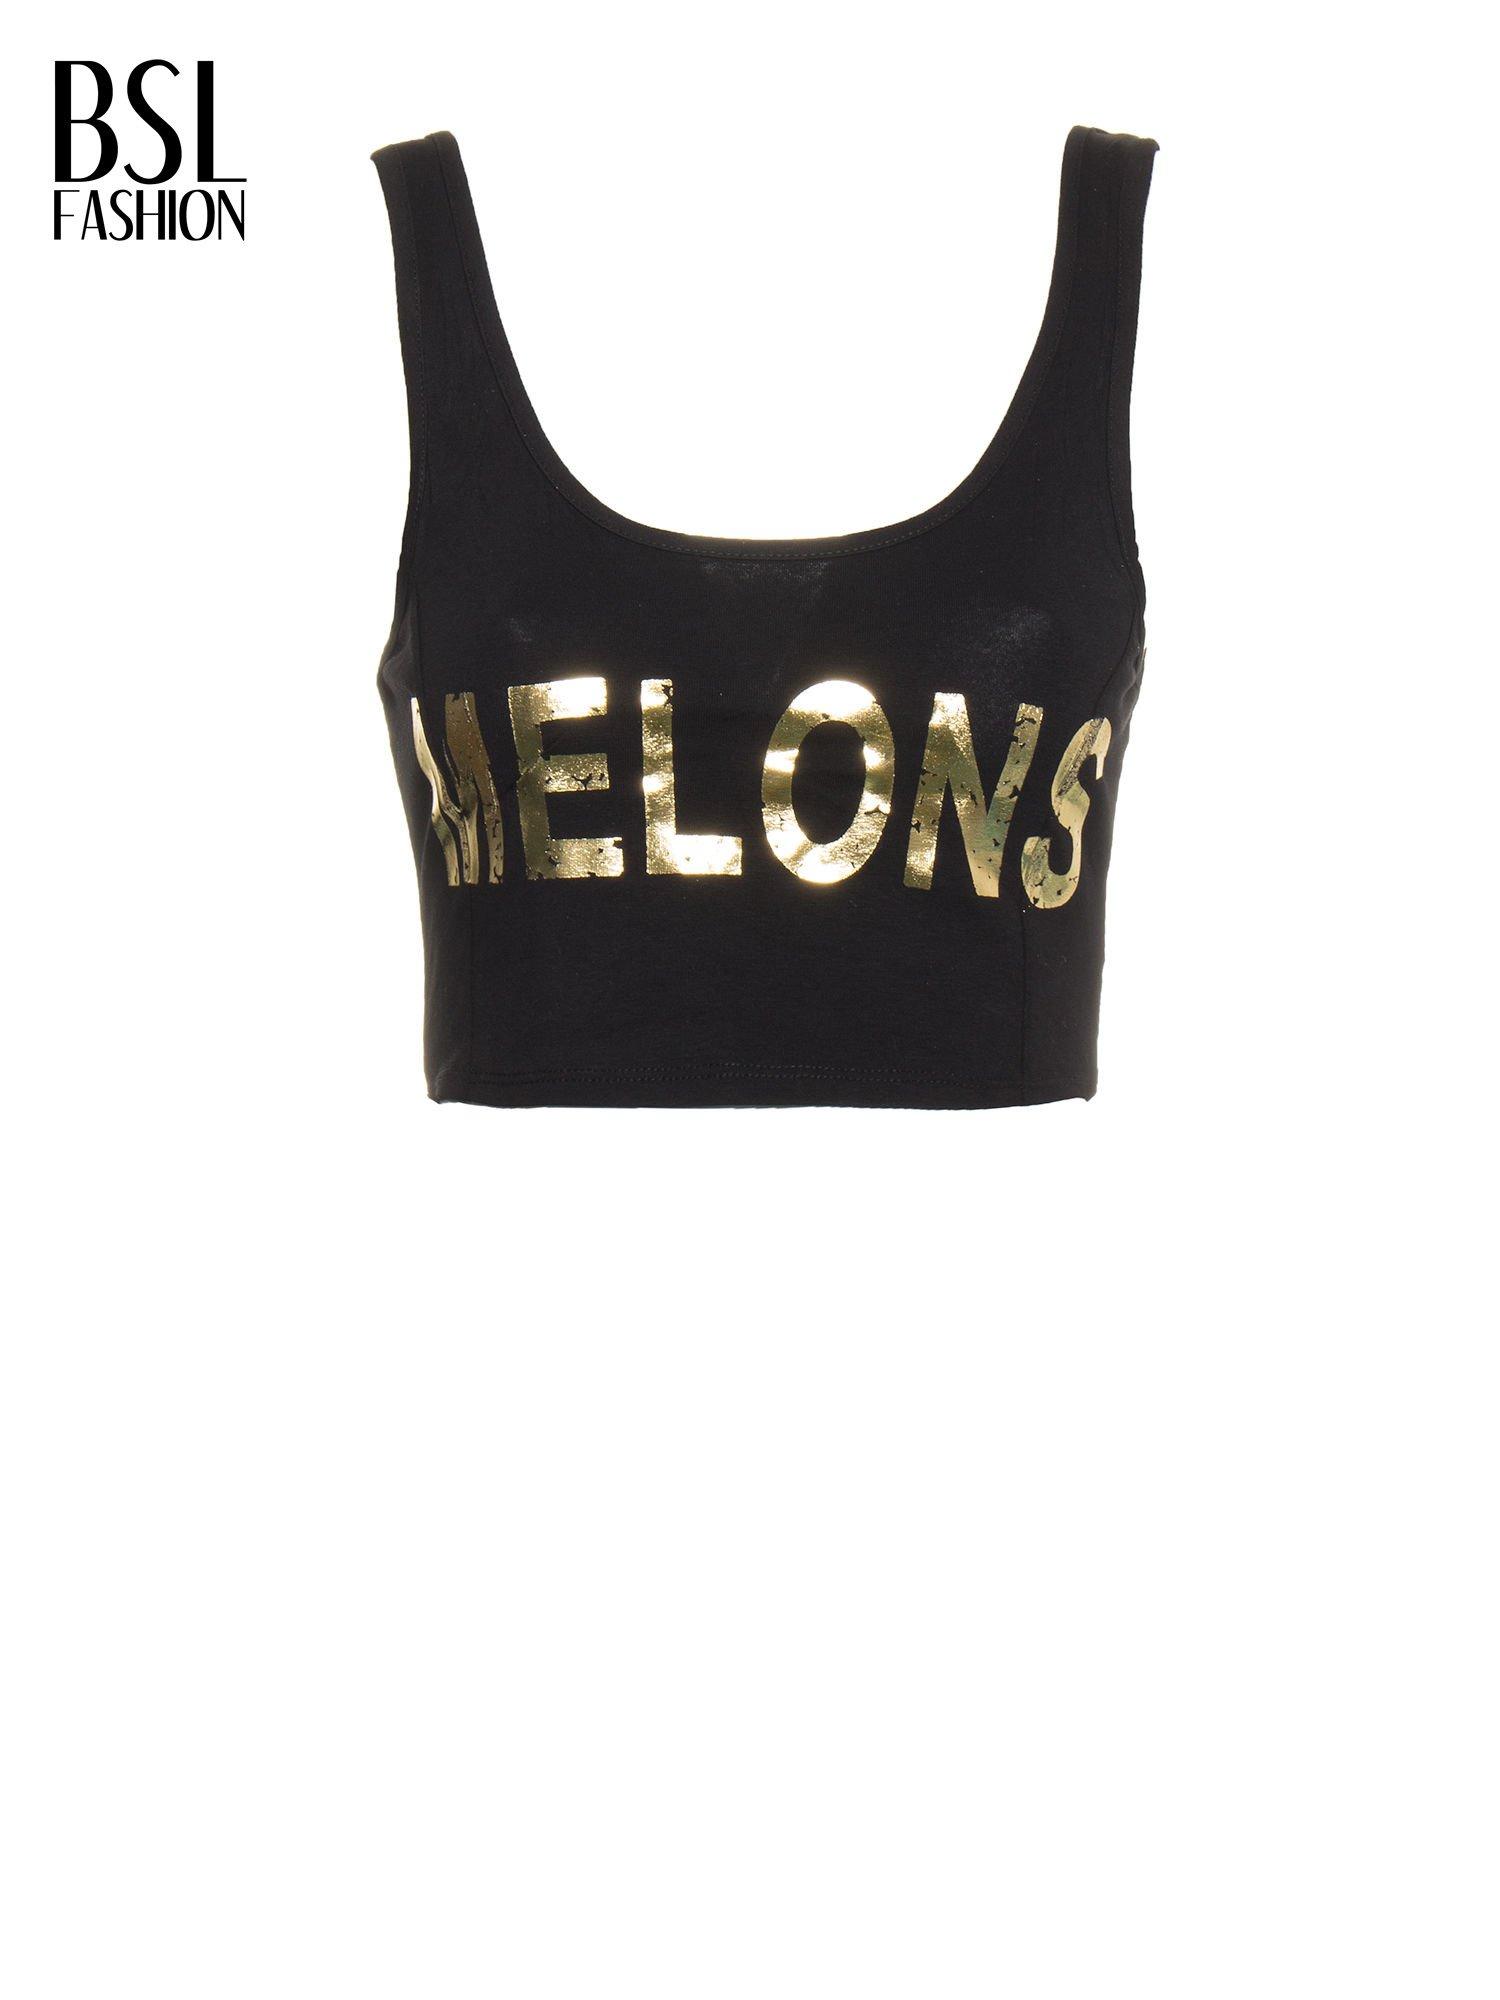 Czarny crop top ze złotym nadrukiem MELONS                                  zdj.                                  2